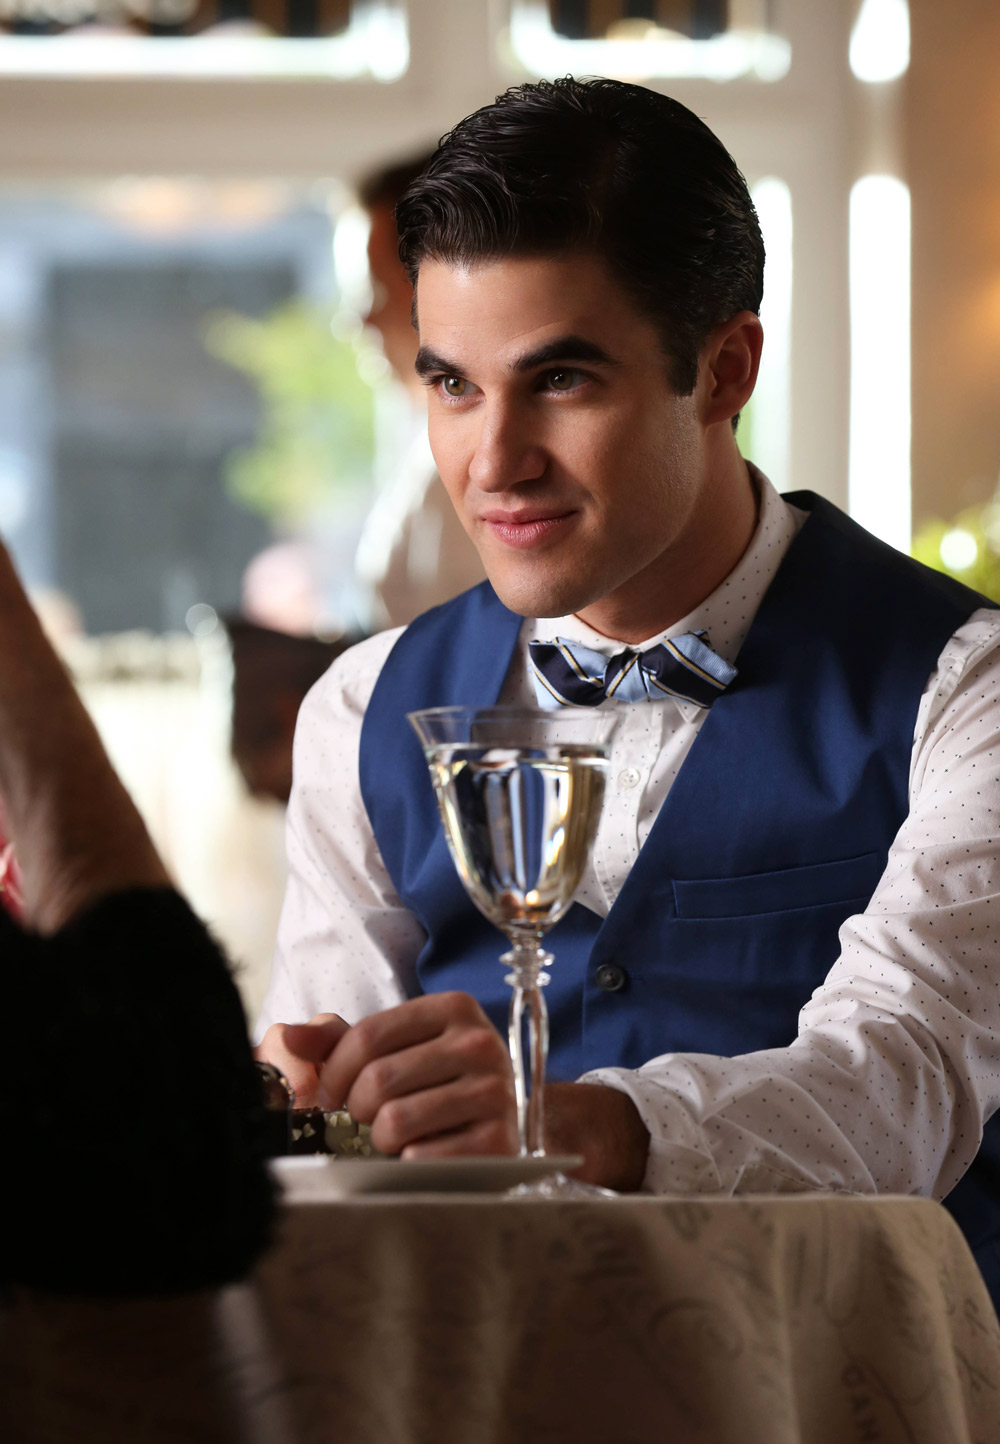 Glee Spoilers: Will Shirley MacLaine Come Between Kurt and Blaine?